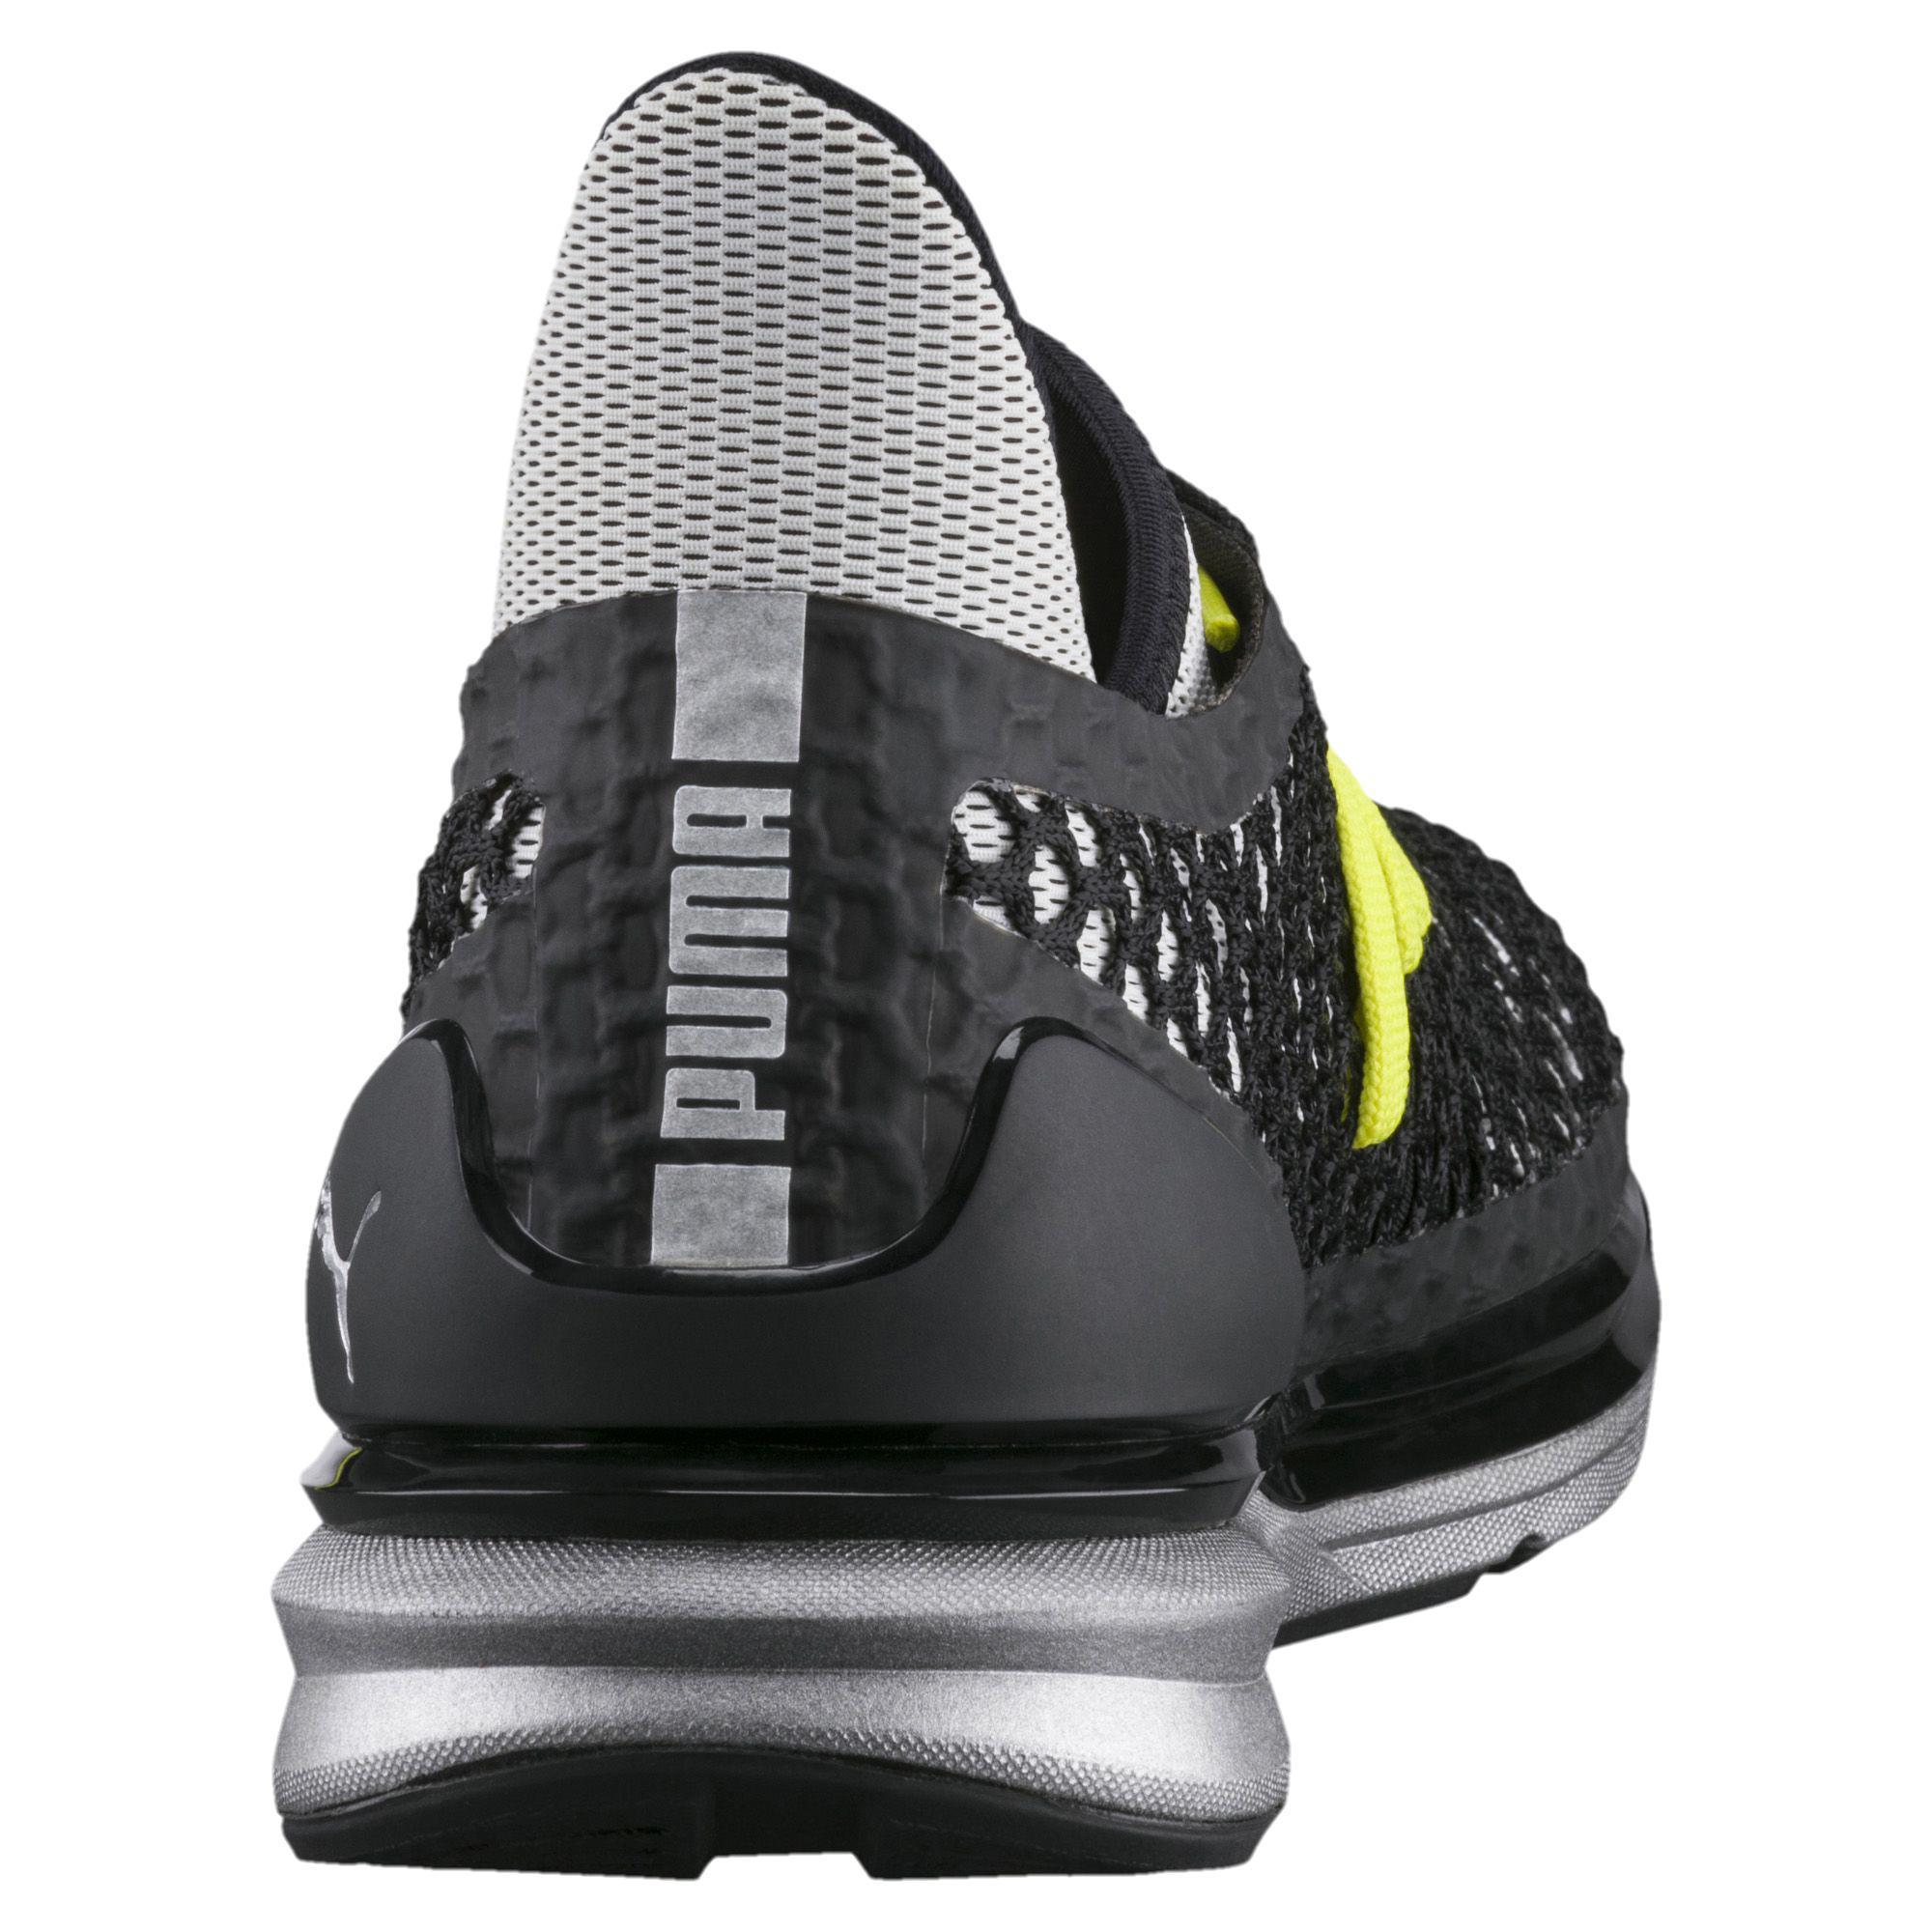 f4cf2496522d Lyst - PUMA Ignite Limitless Netfit Nightcat Women s Sneakers in Black